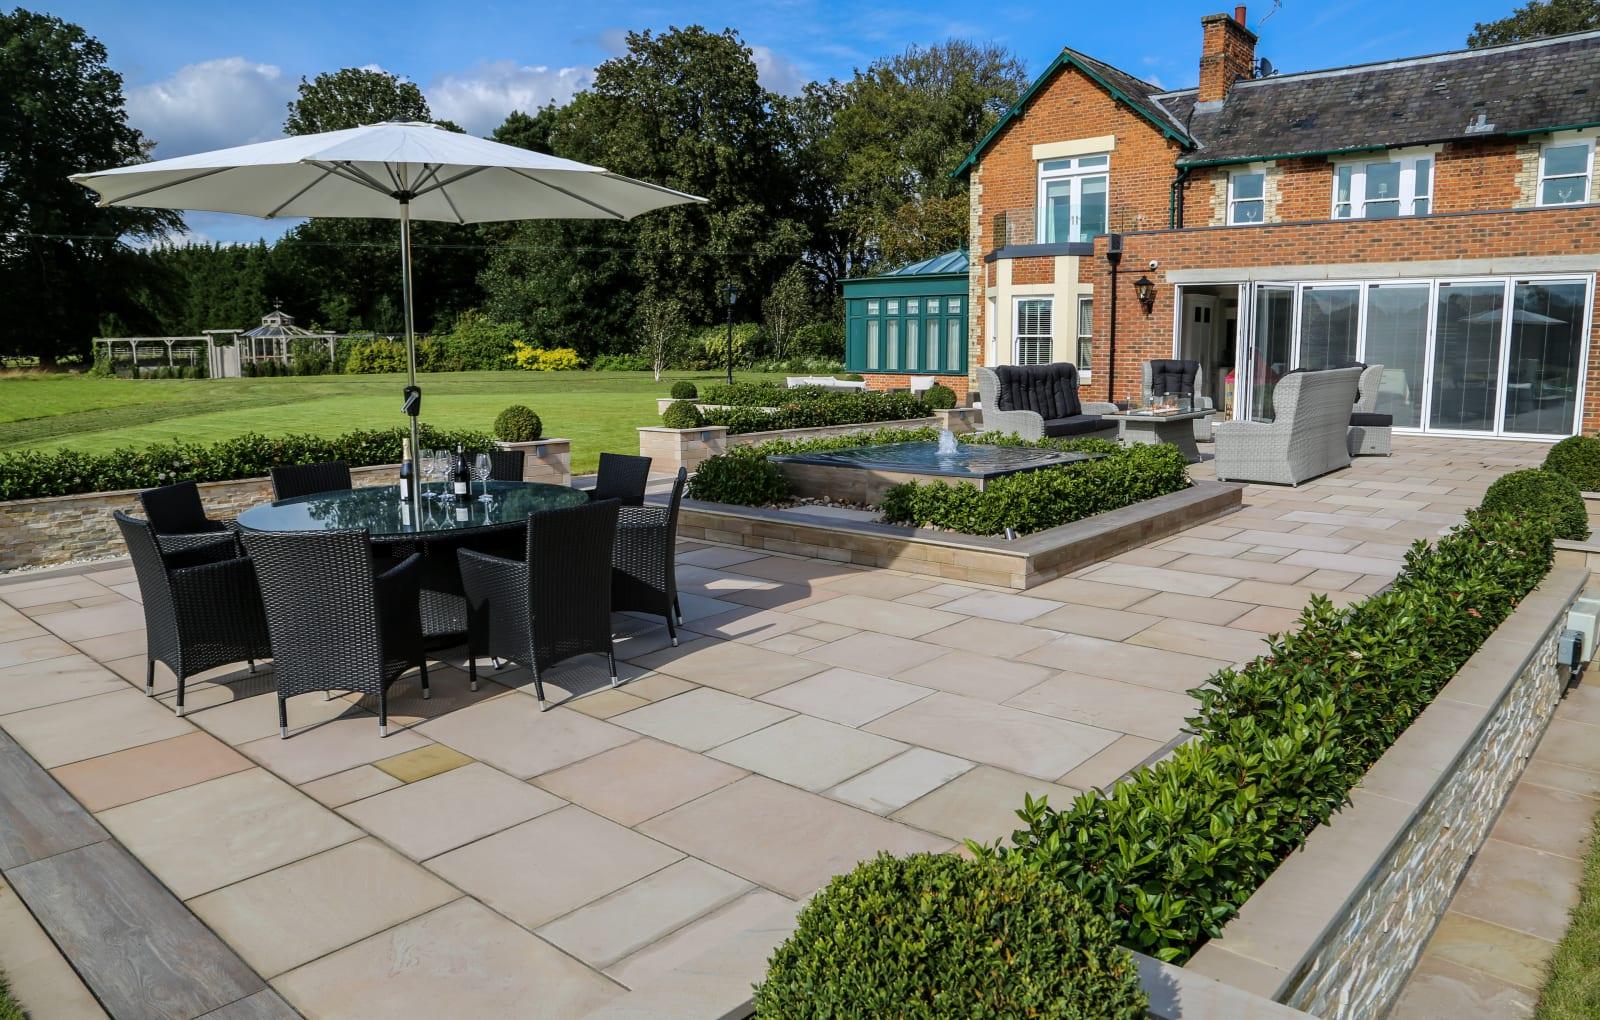 Marshalls Fairstone Sawn Versuro garden paving